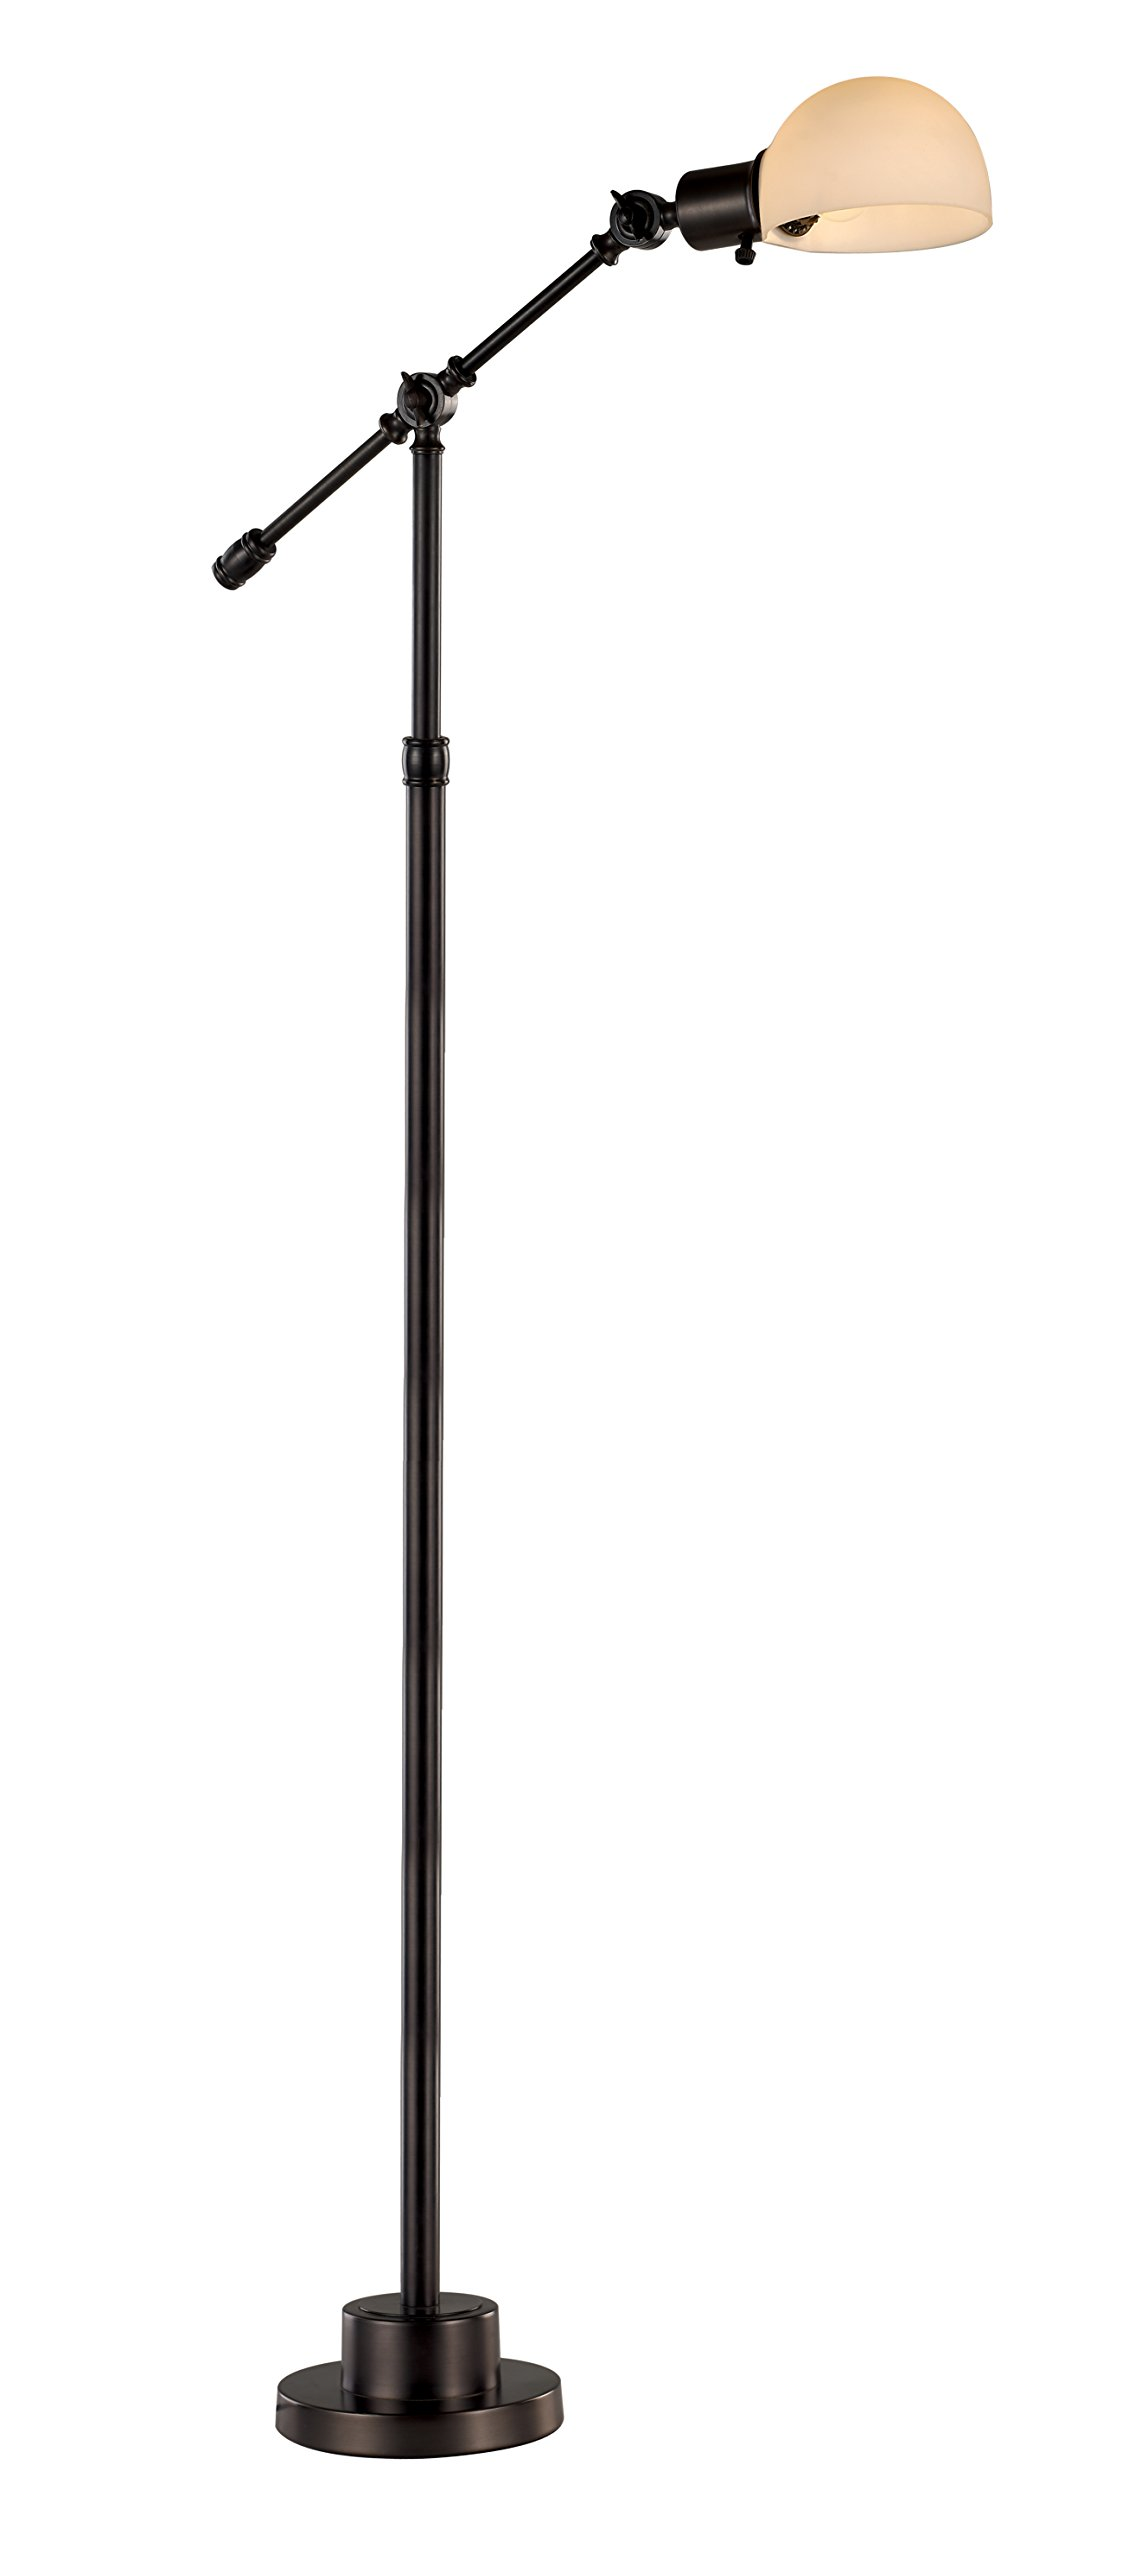 Trans Globe Lighting RTL-8858 Counterbalance Floor Lamp, Bronze